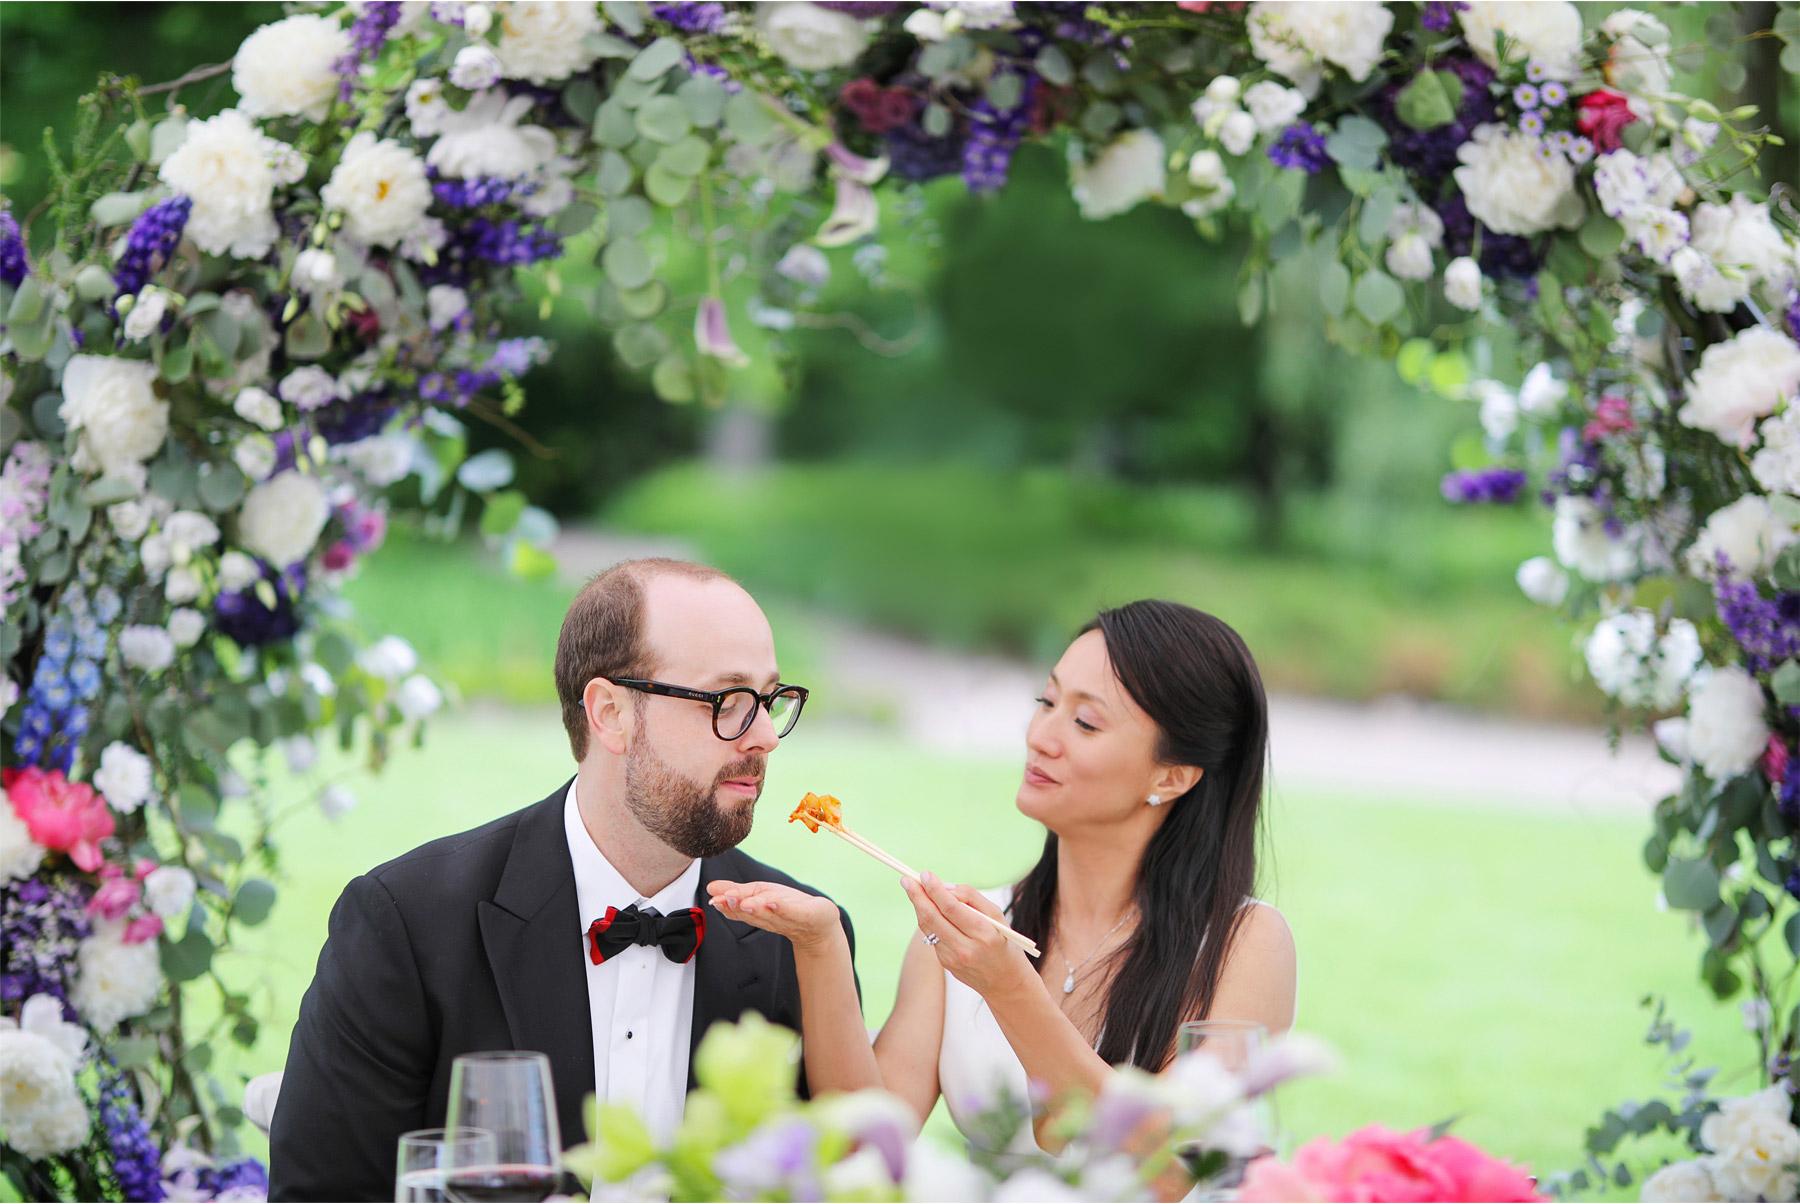 19-Vick-Photography-Wedding-Stouts-Island-Lodge-Wisconsin-Summer-Reception-Outdoor-Food-Bride-Groom-MiJa-and-Lucius.jpg